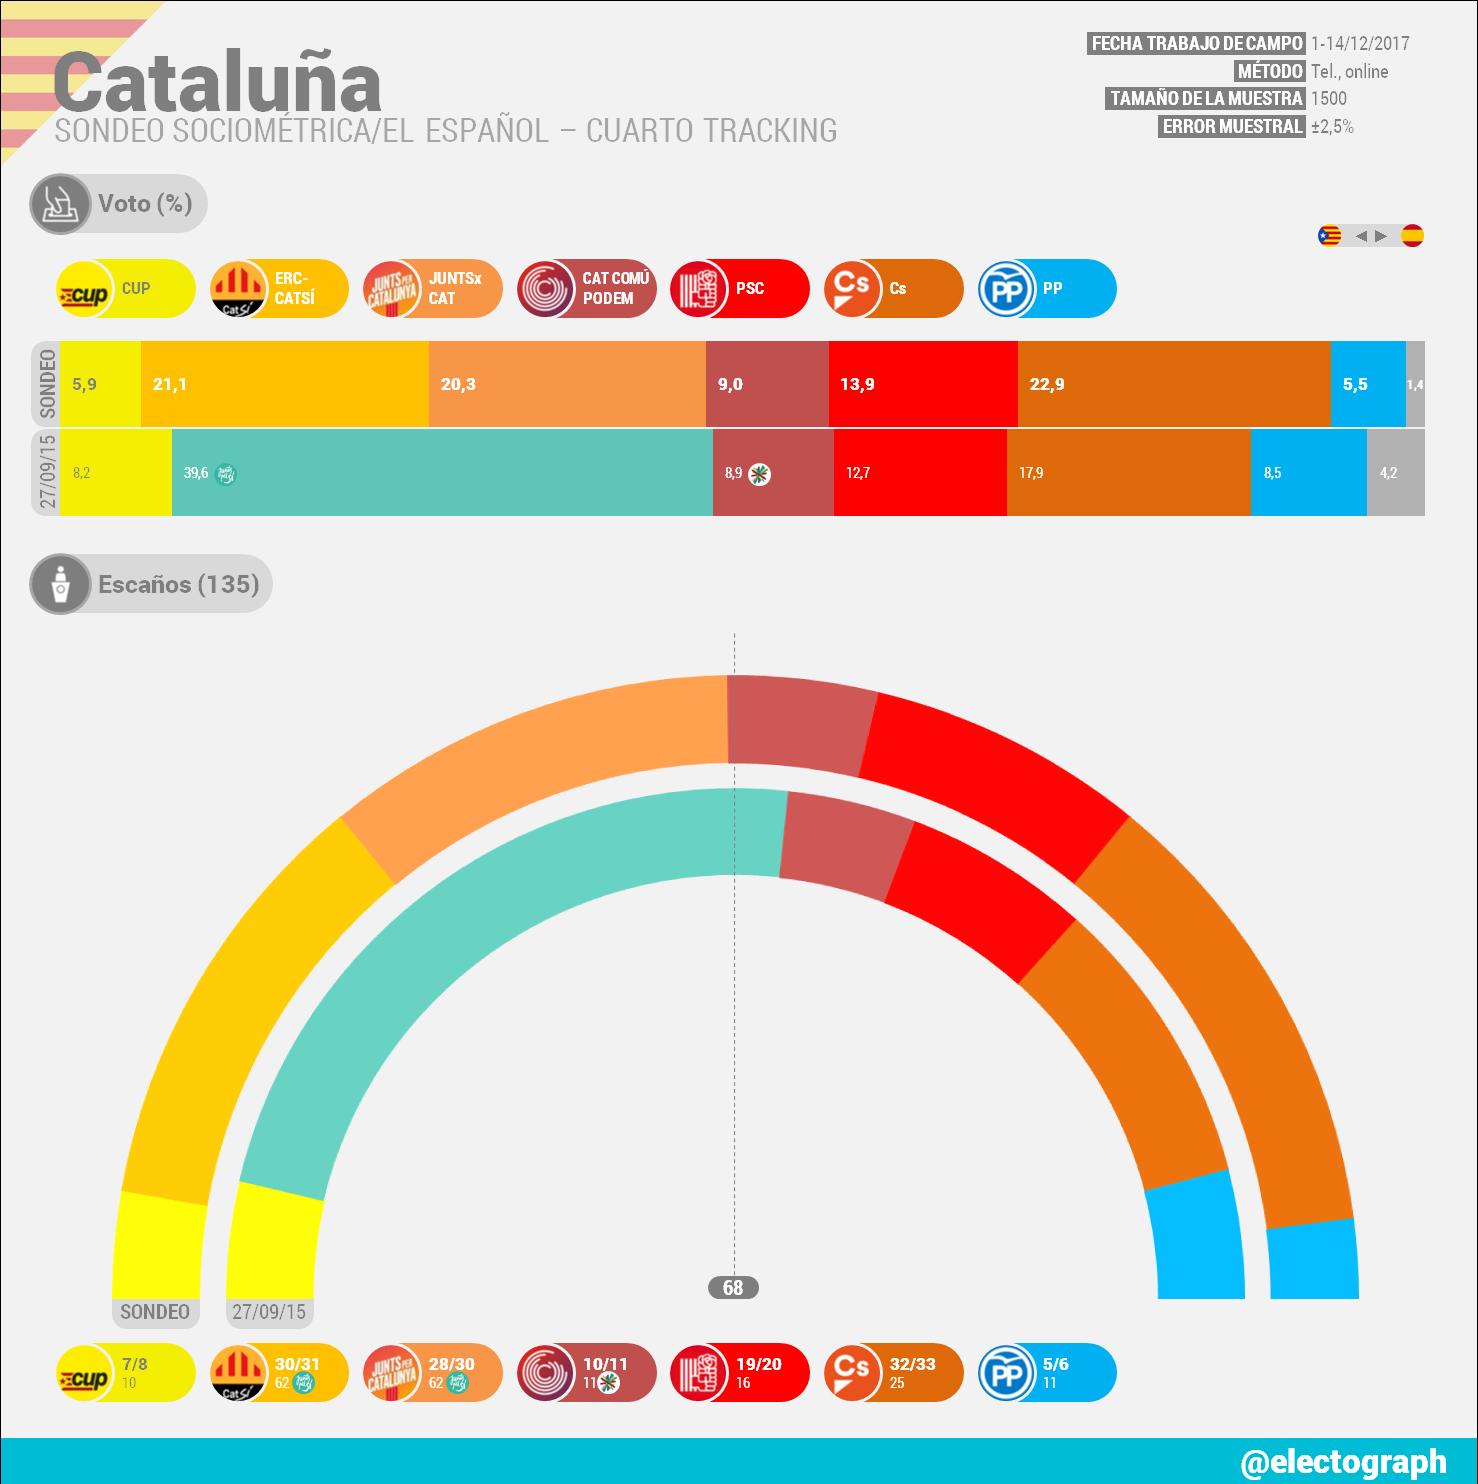 Encuestas para Cataluña - Página 2 CAT_171215_SocioMetrica